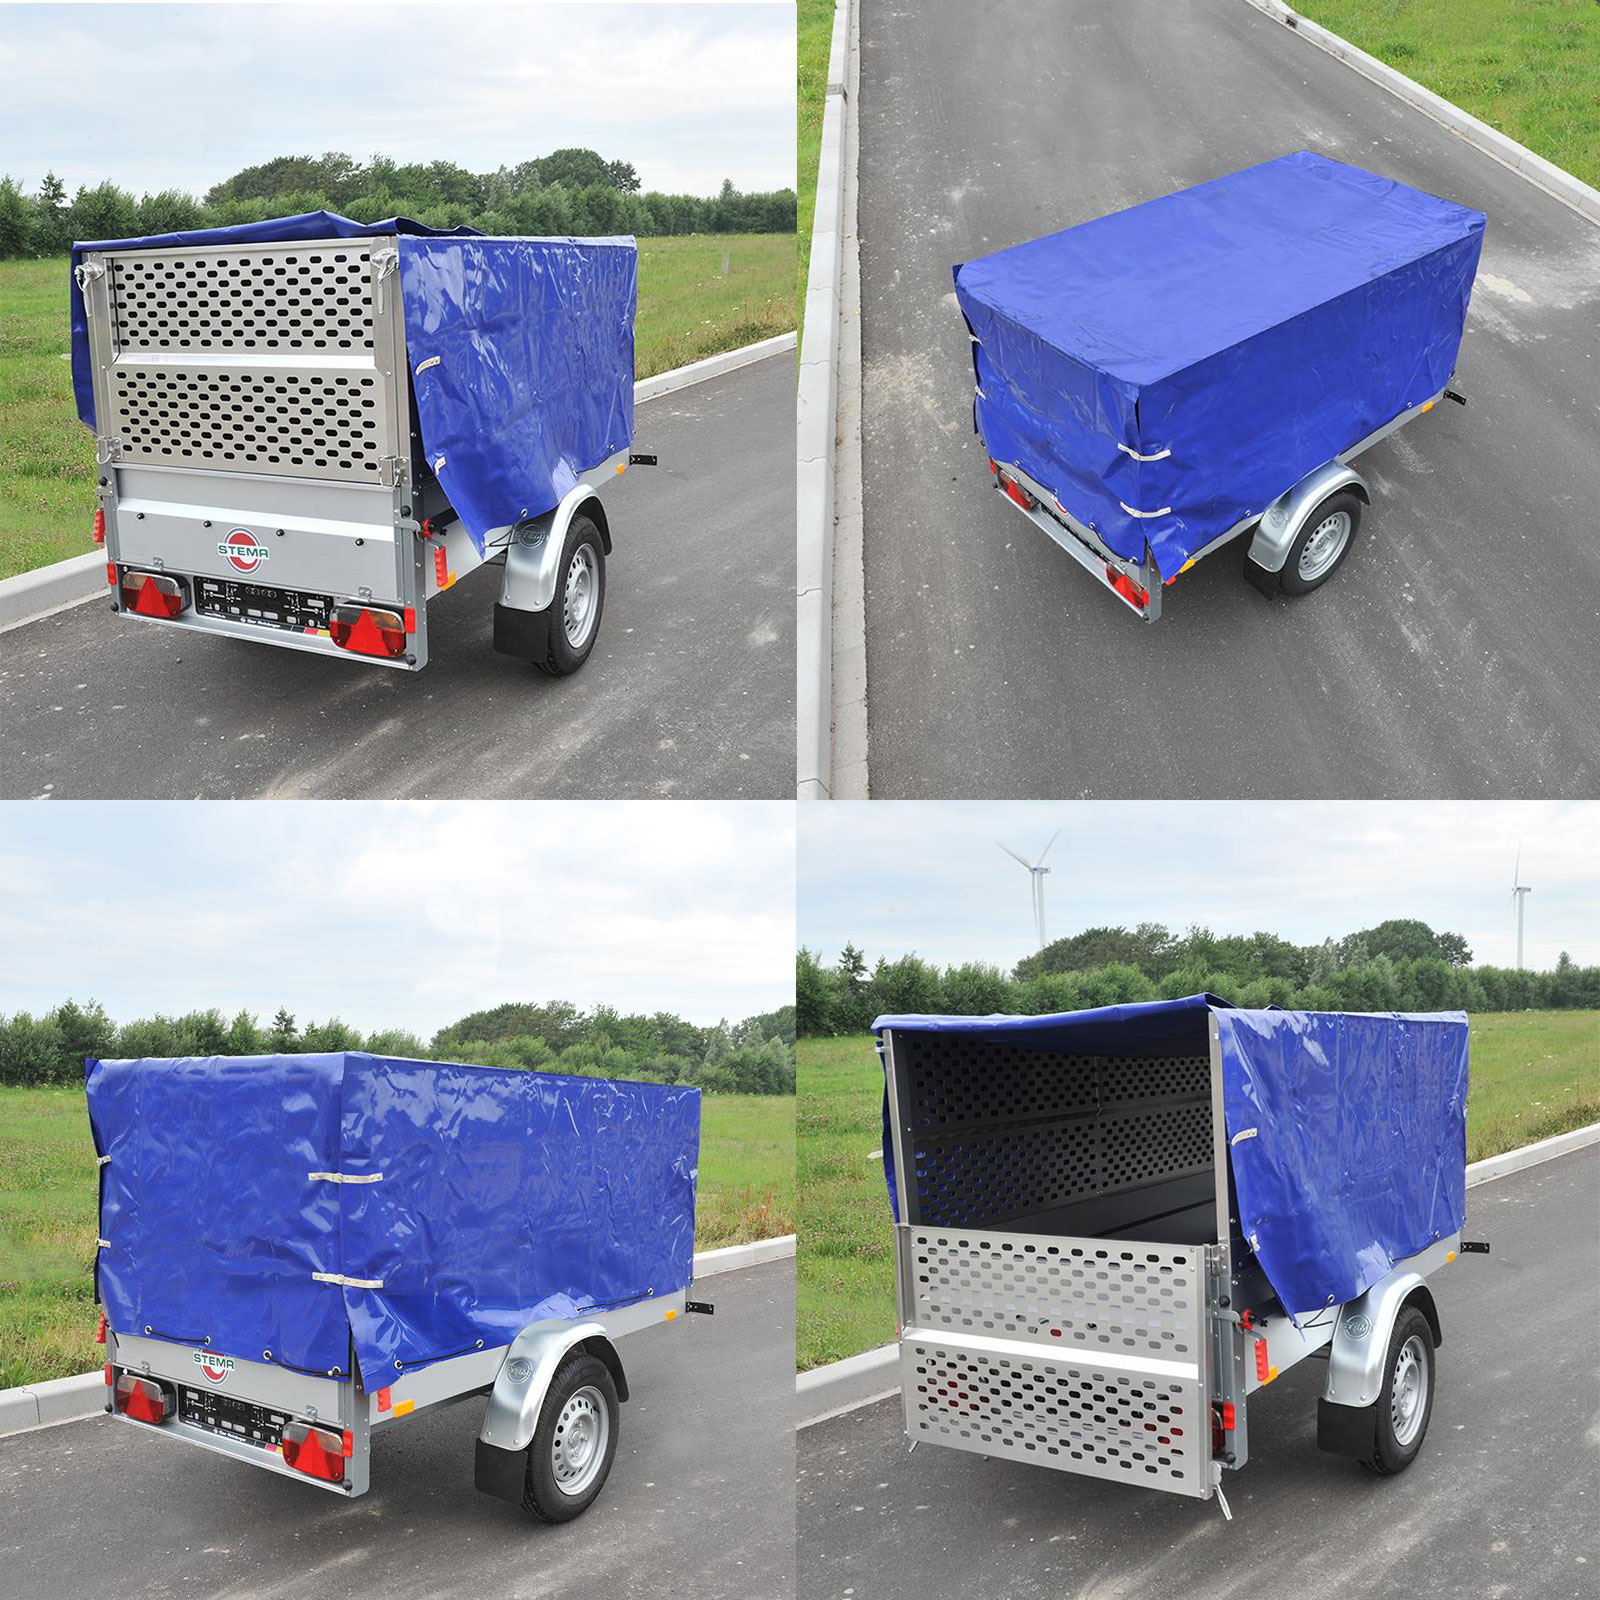 pkw anh nger hochplane blau mit gummigurt 2090x1140x880 mm neu ovp ebay. Black Bedroom Furniture Sets. Home Design Ideas